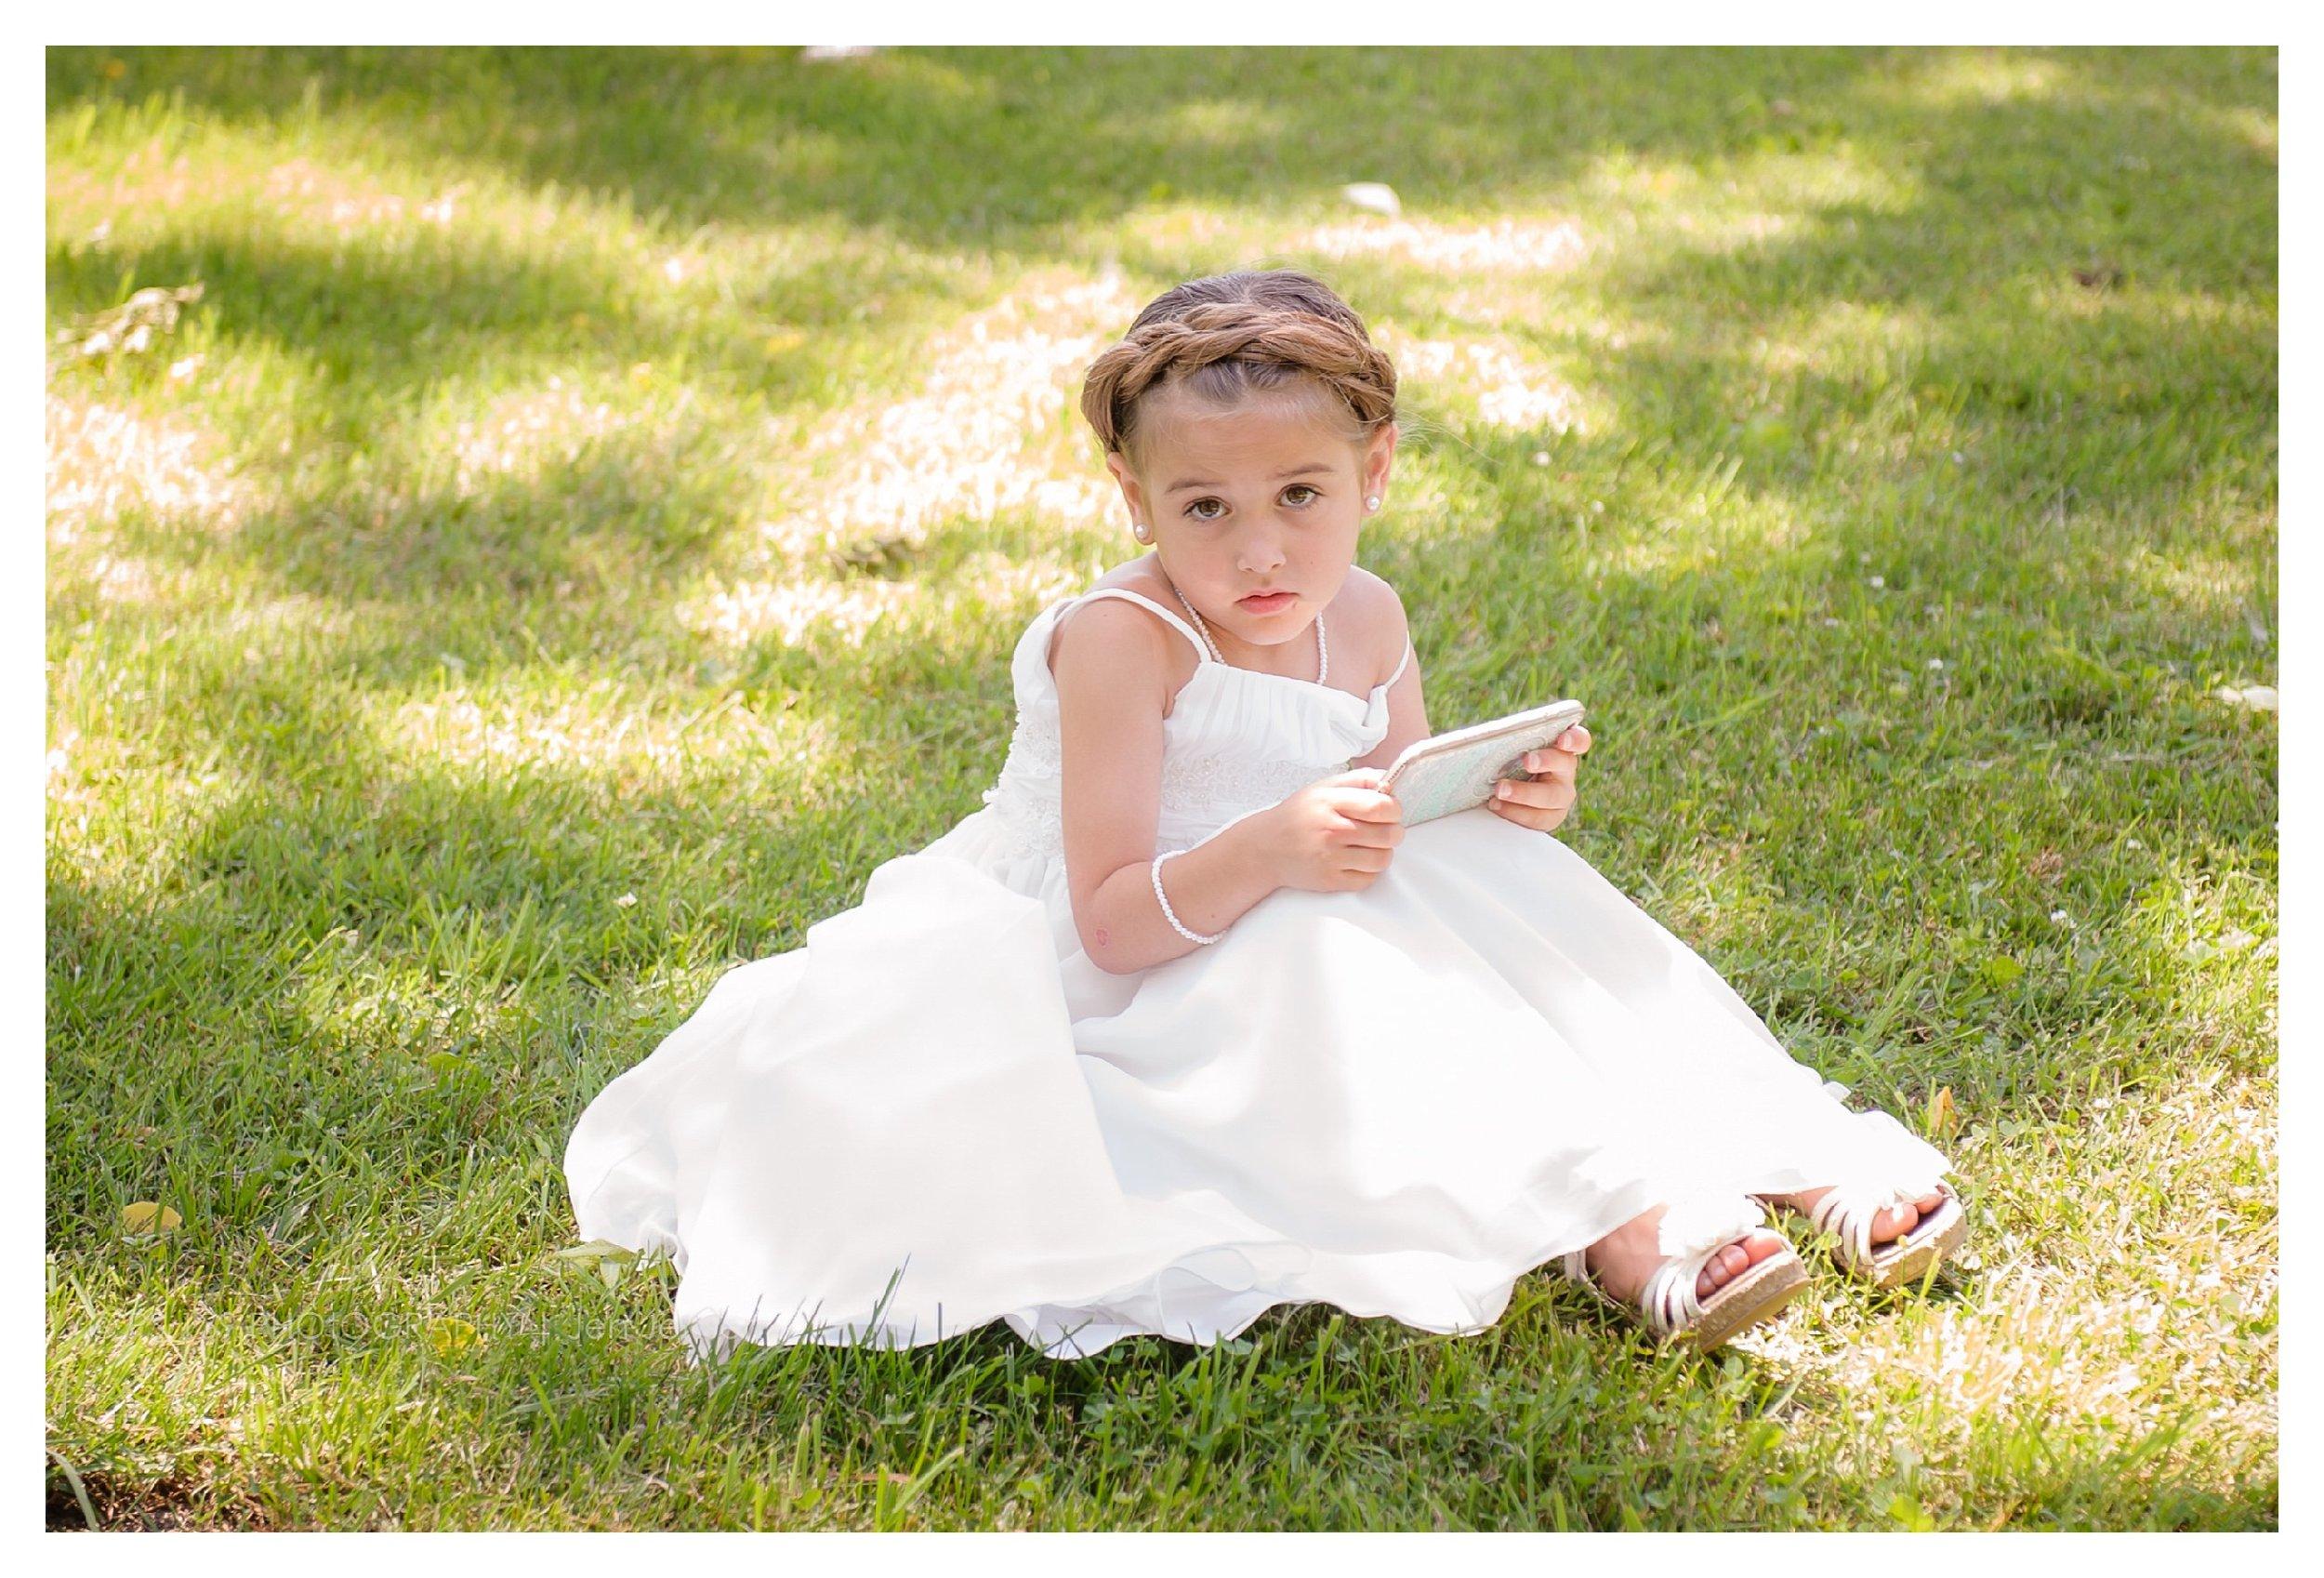 oregon Illinois oak lane farm wisconsin wedding photographer bayfield wi ps 139 photography jen jensen_0244.jpg